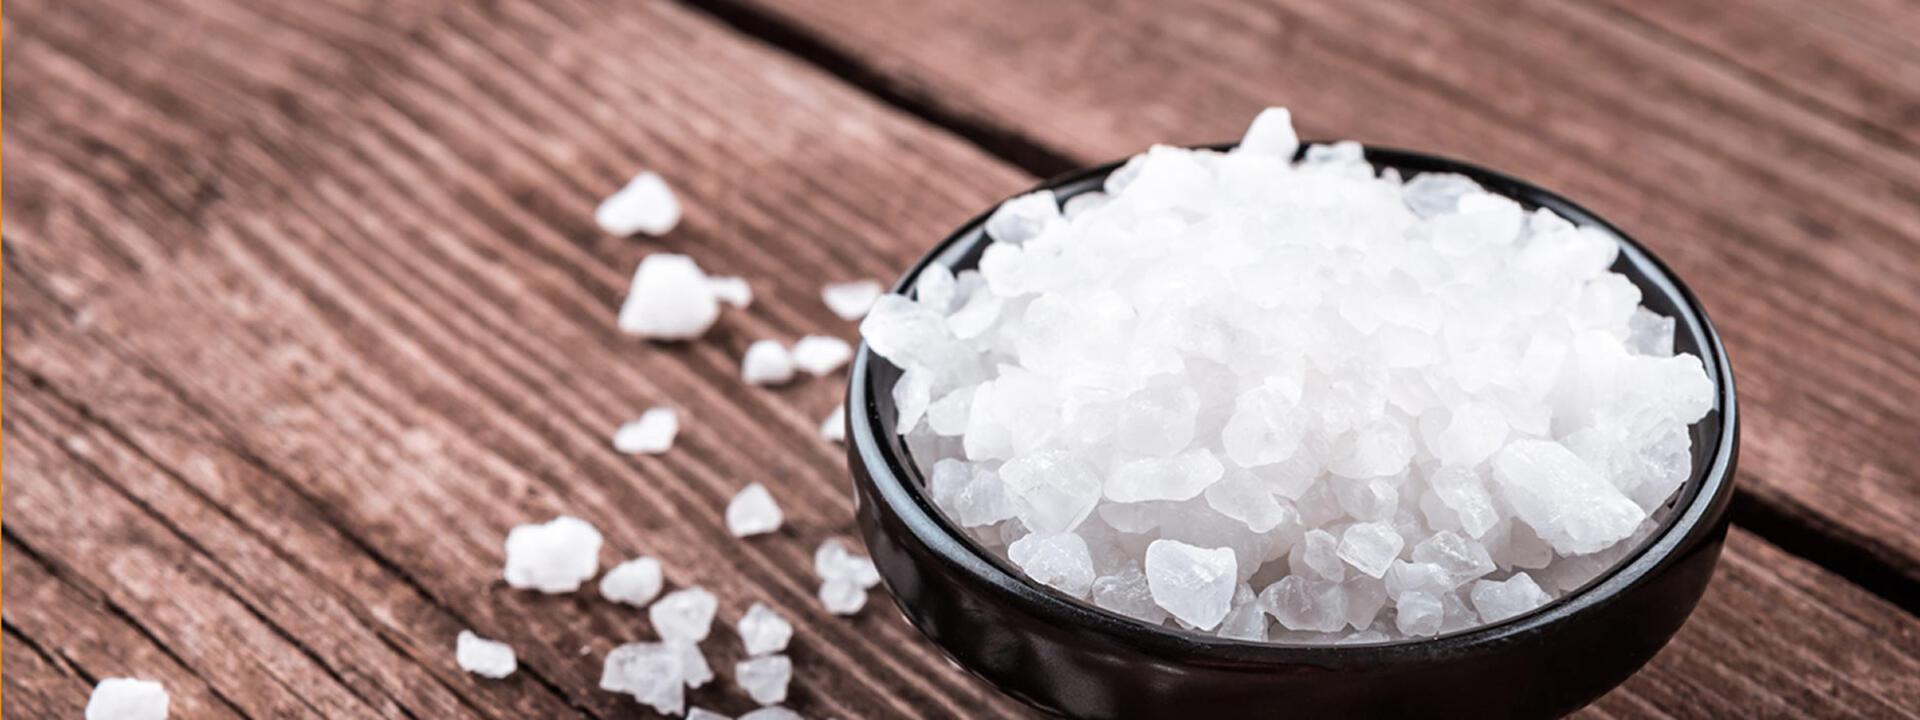 riccionepiadina en salt-piadina 002